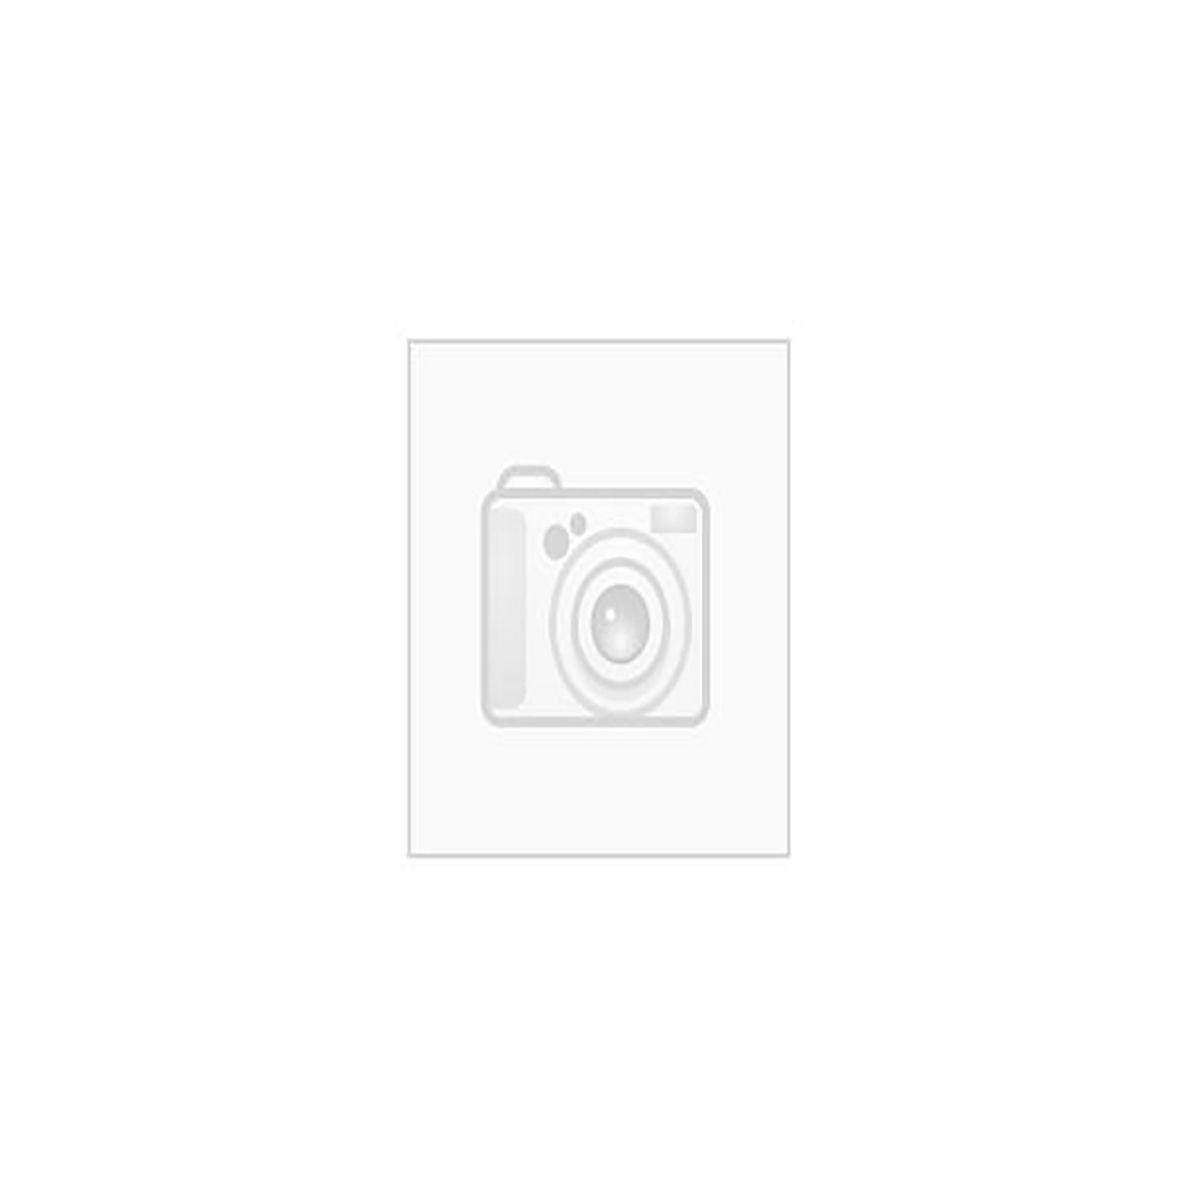 Tapwell BOX006 Sort Matt - Servantbatteri